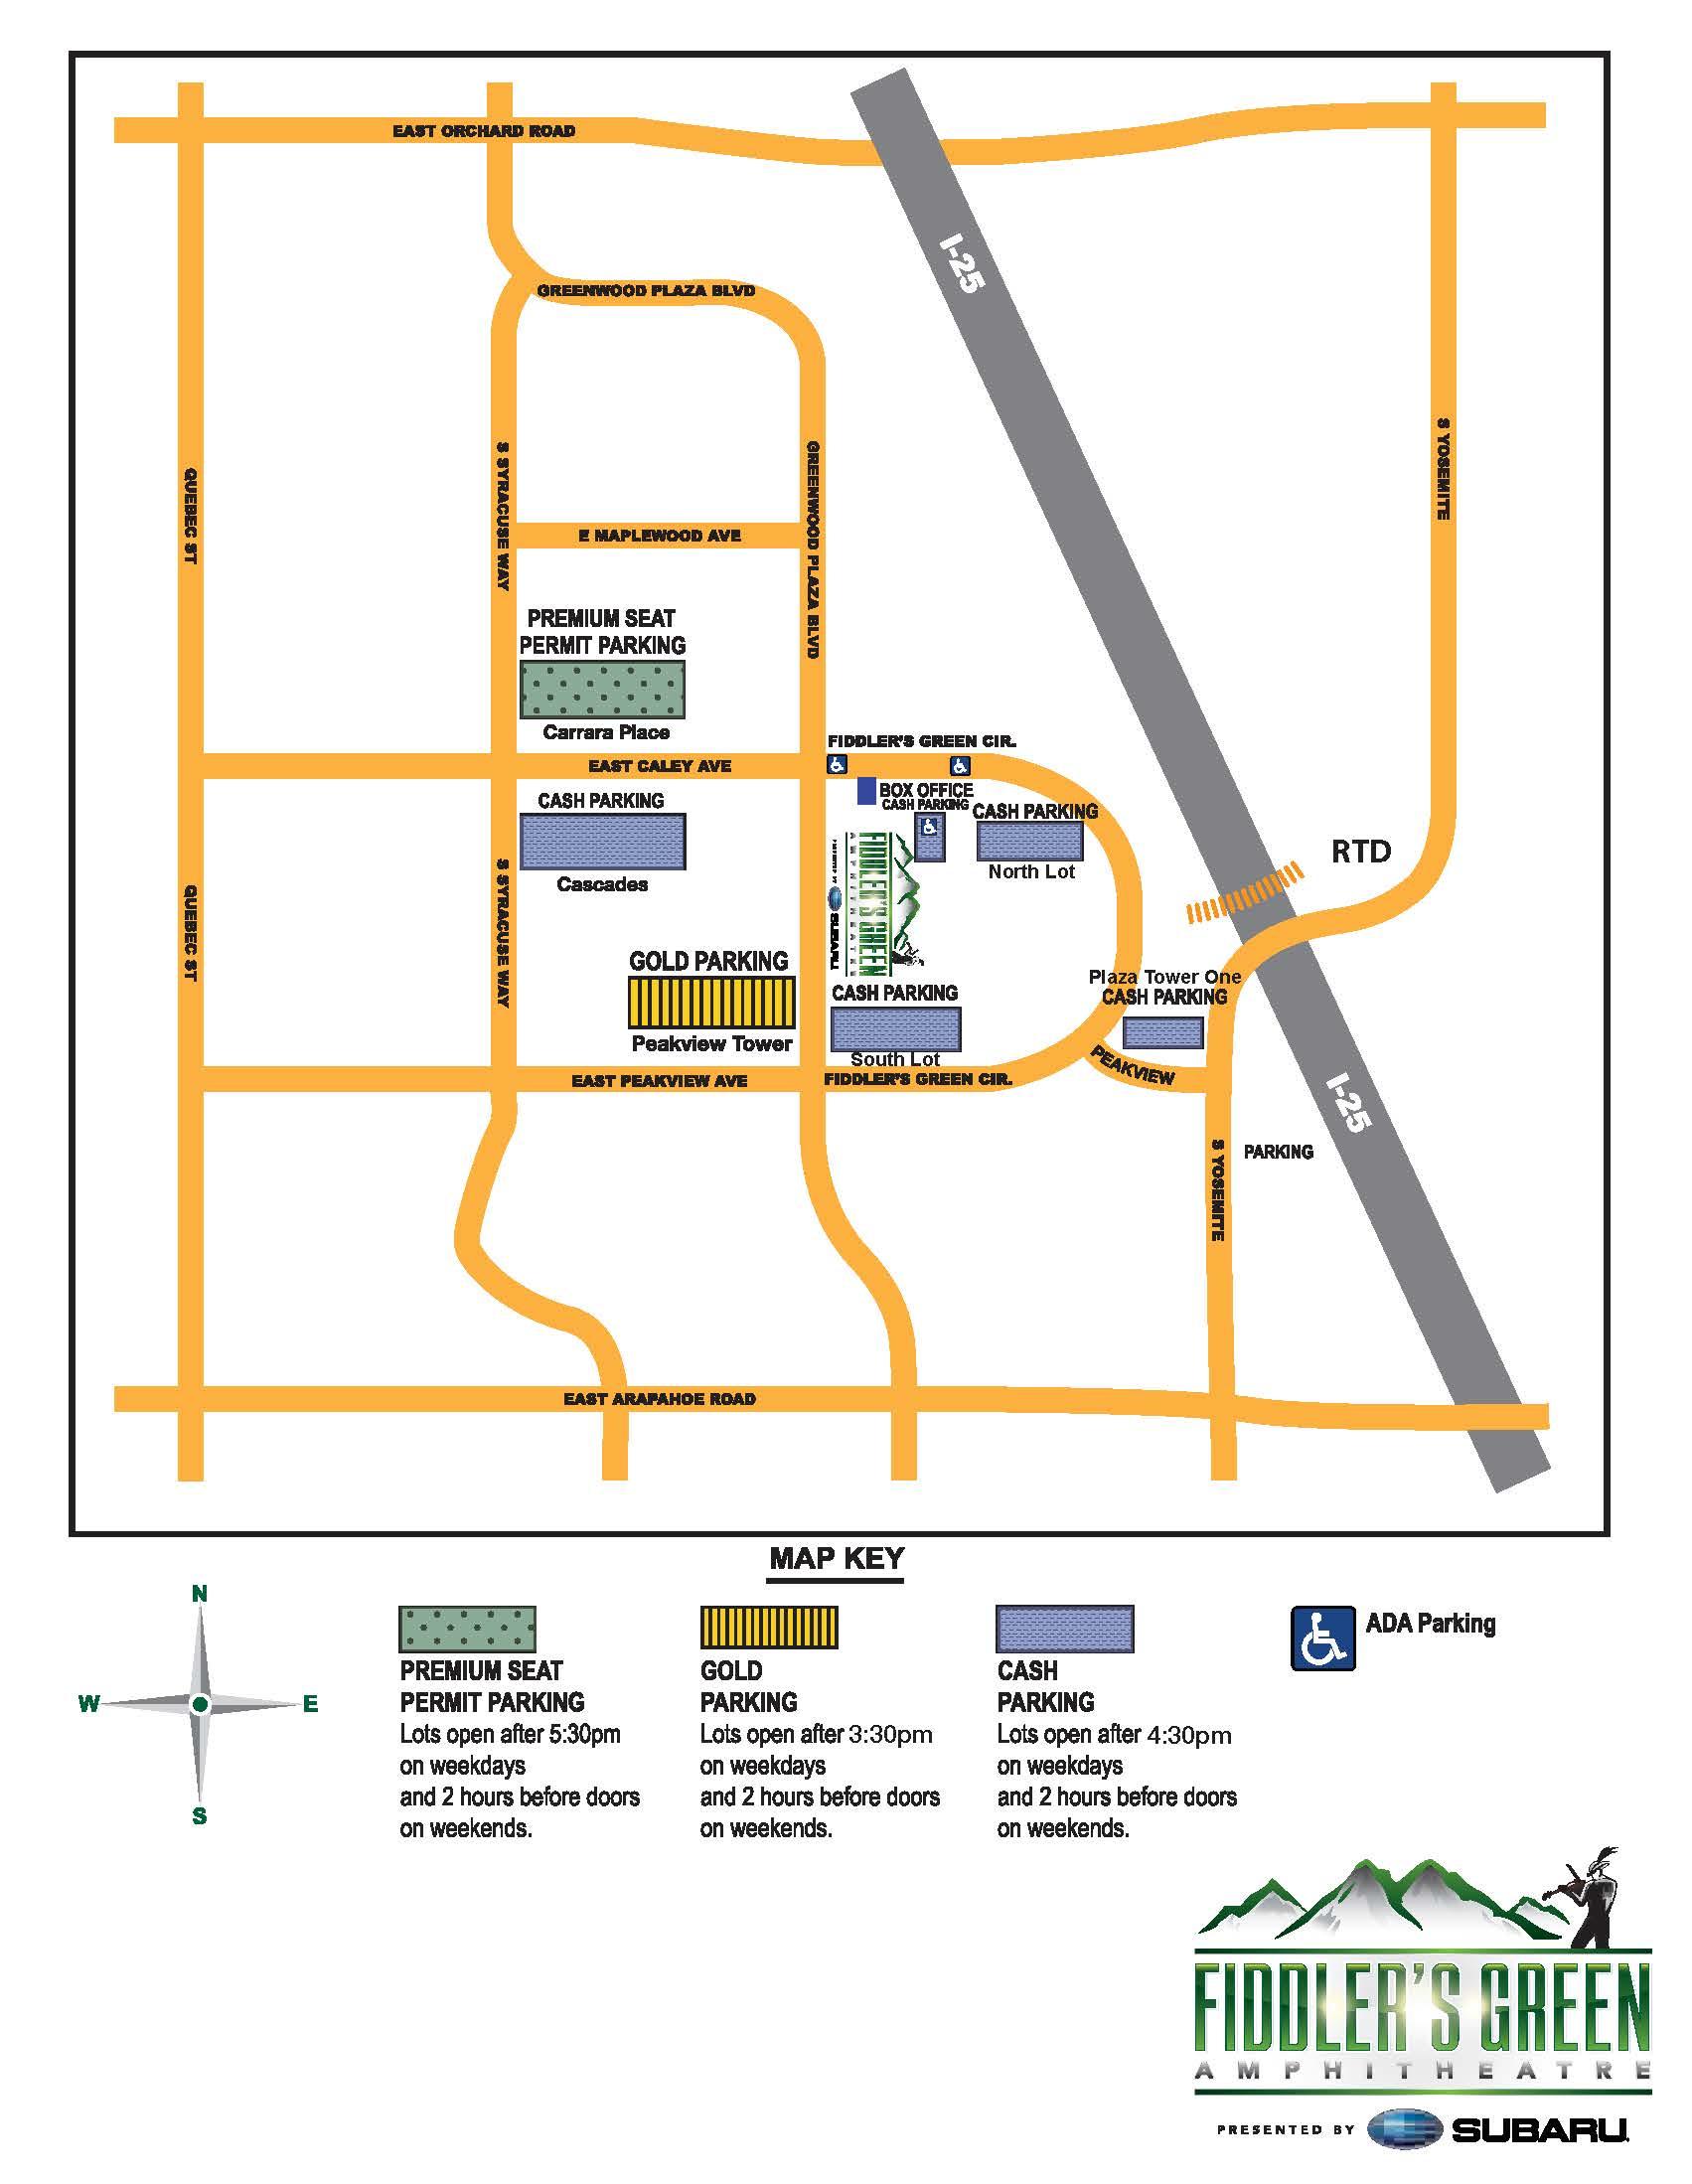 Fiddlers Green Parking Map